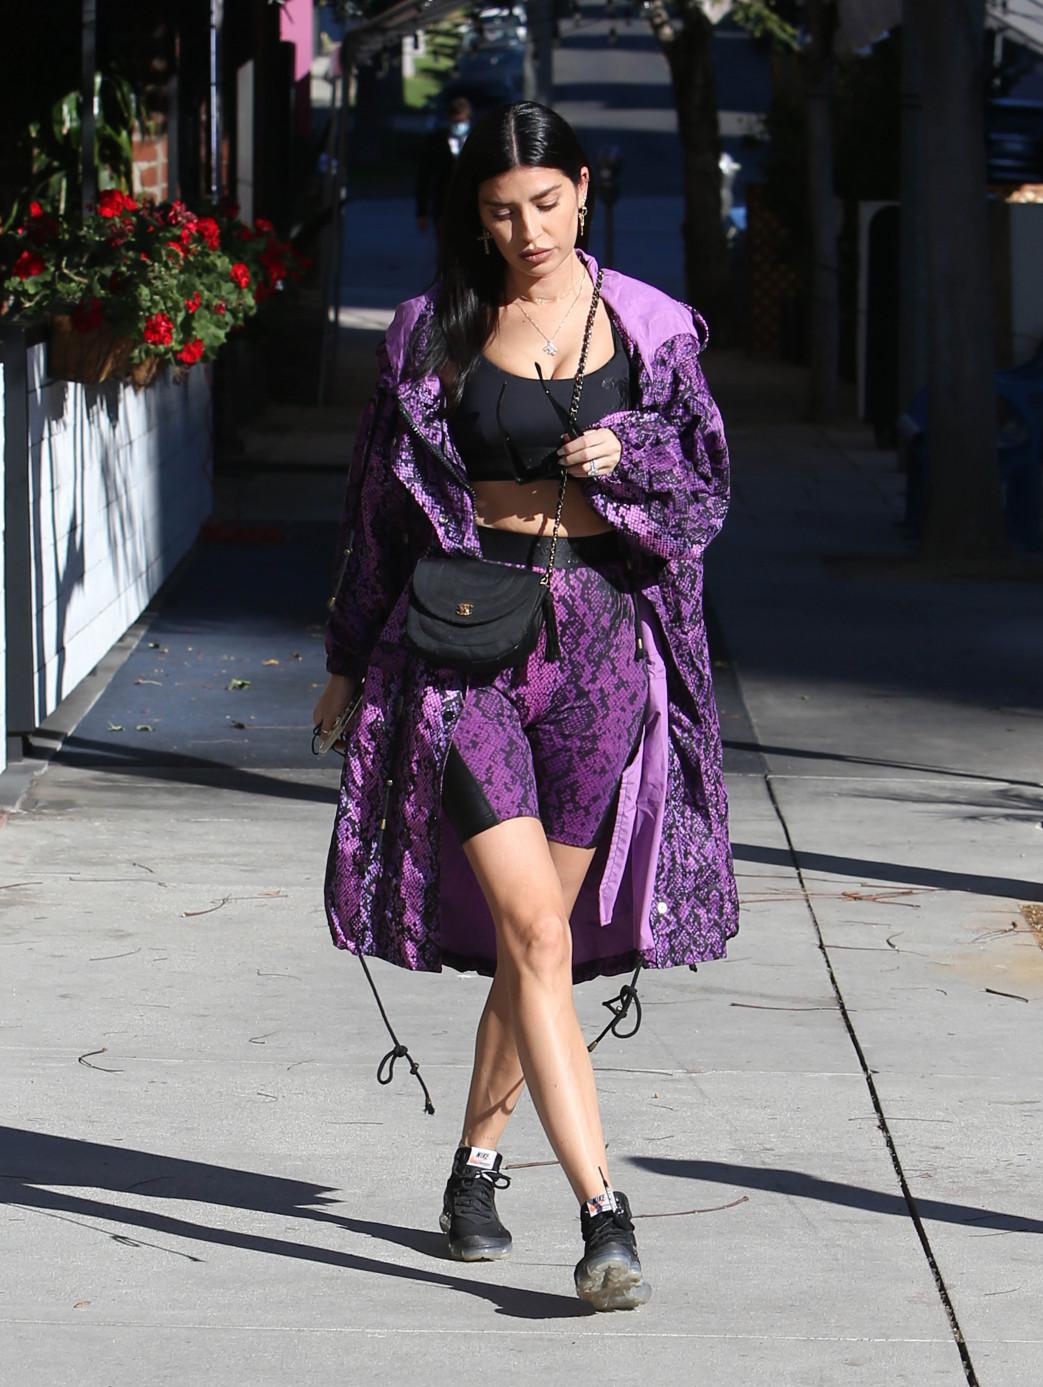 Nicole-Williams-Cameltoe-In-Purple-Tights-7.jpg